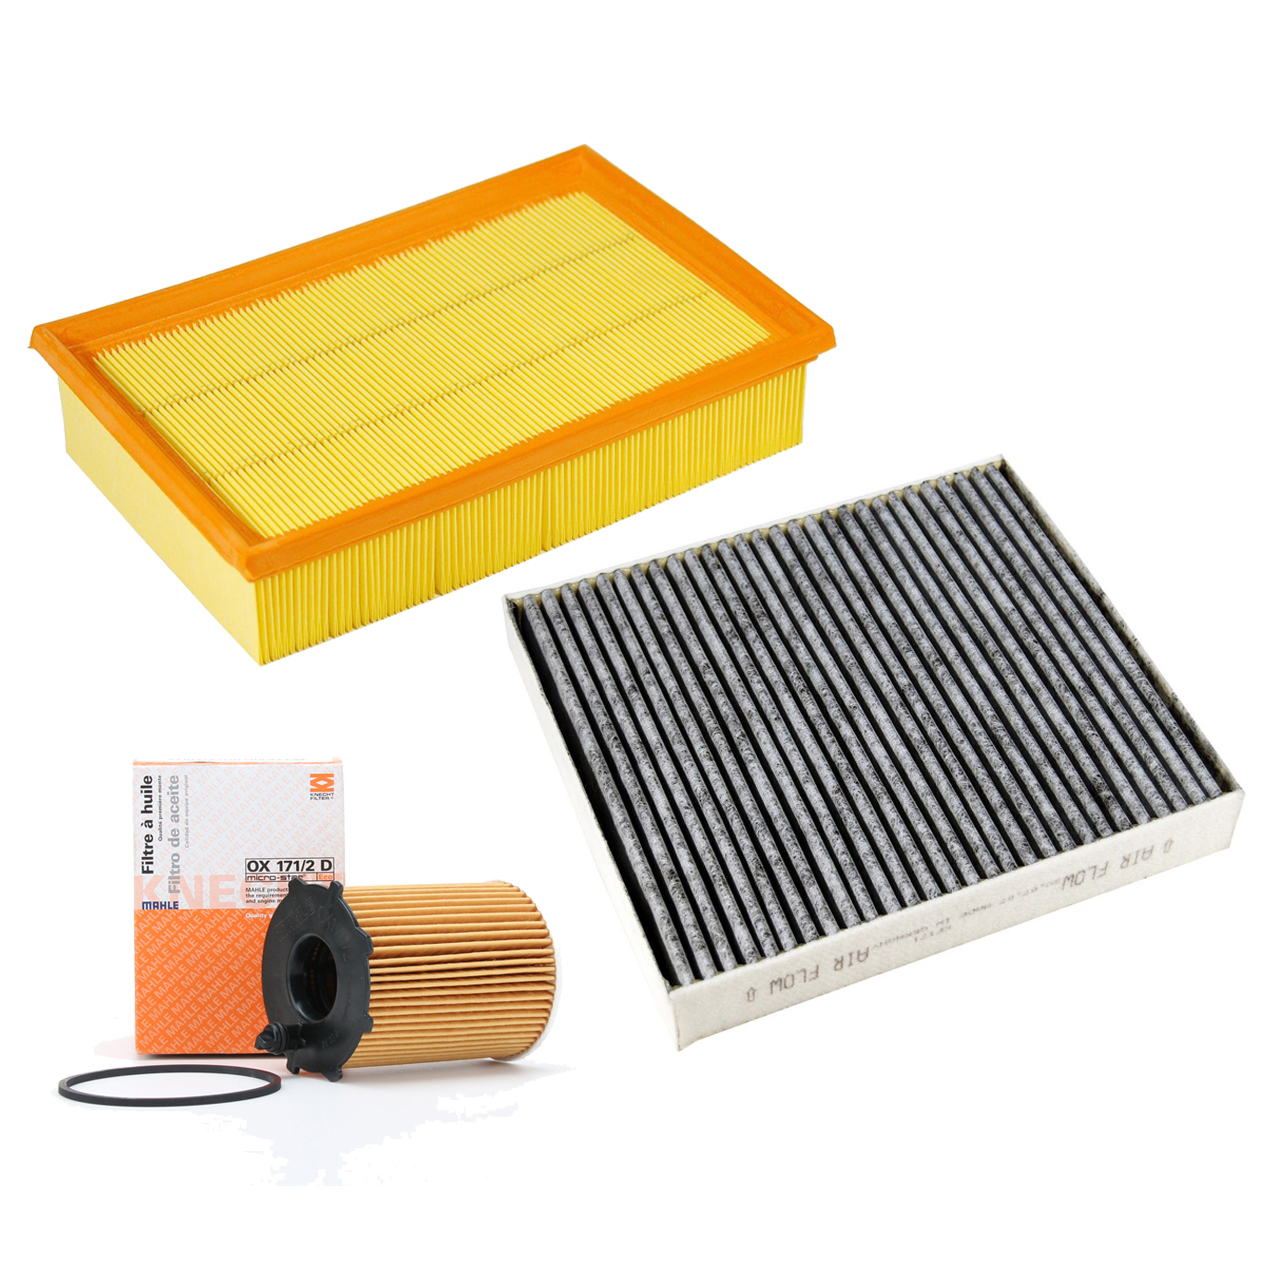 Inspektionskit Filterpaket FORD Focus C-Max DM2 1.6 TDCi 90 / 109 PS